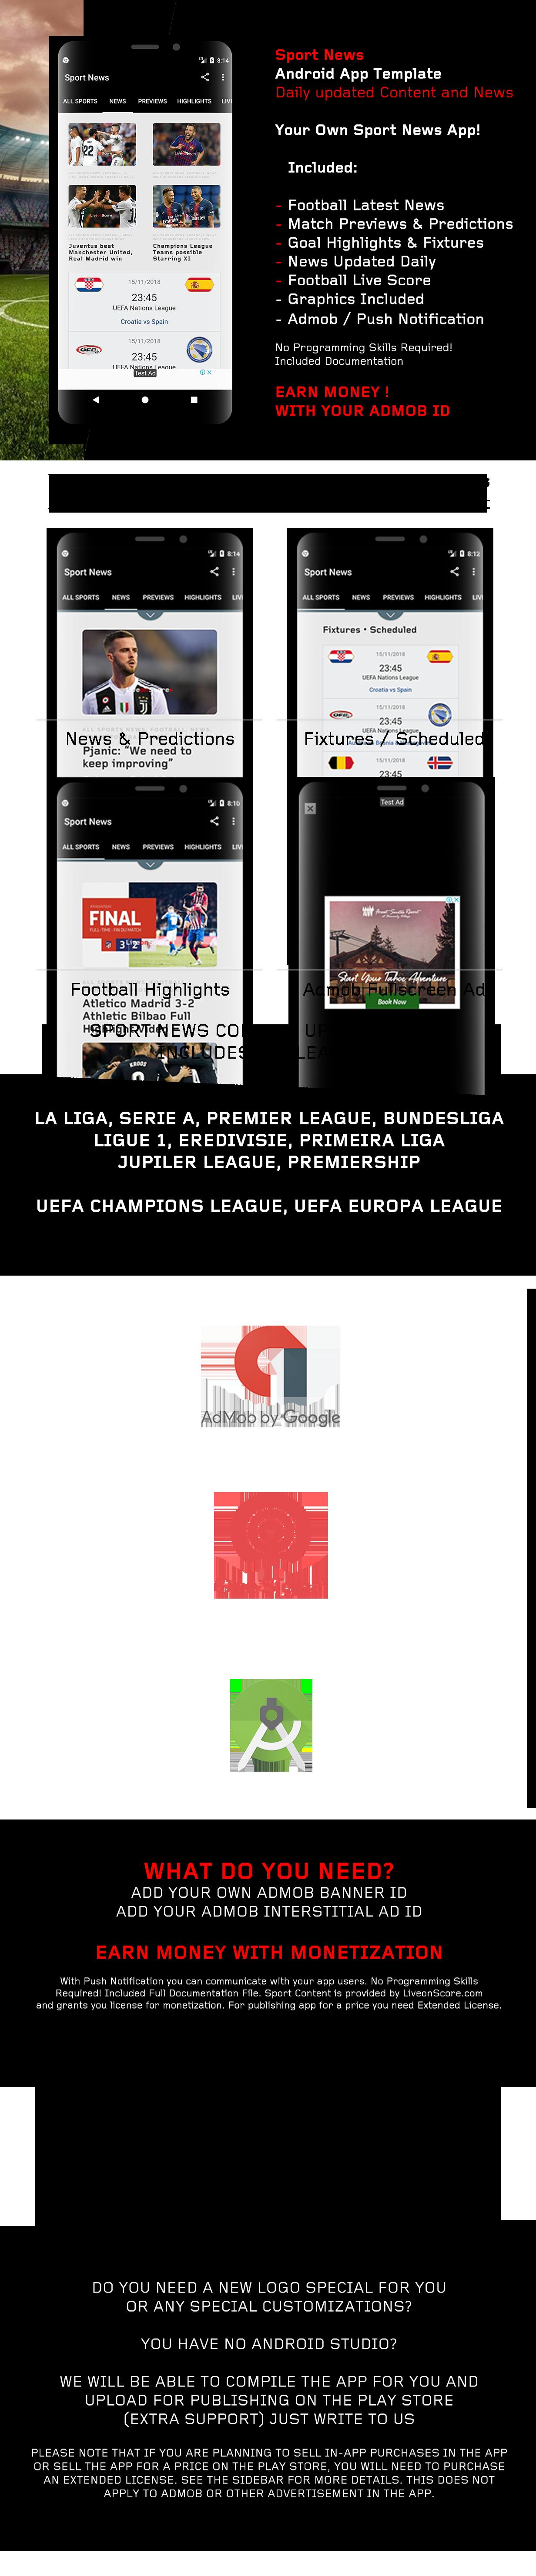 Sport News - Football Android App Template (Admob/Push) - 1